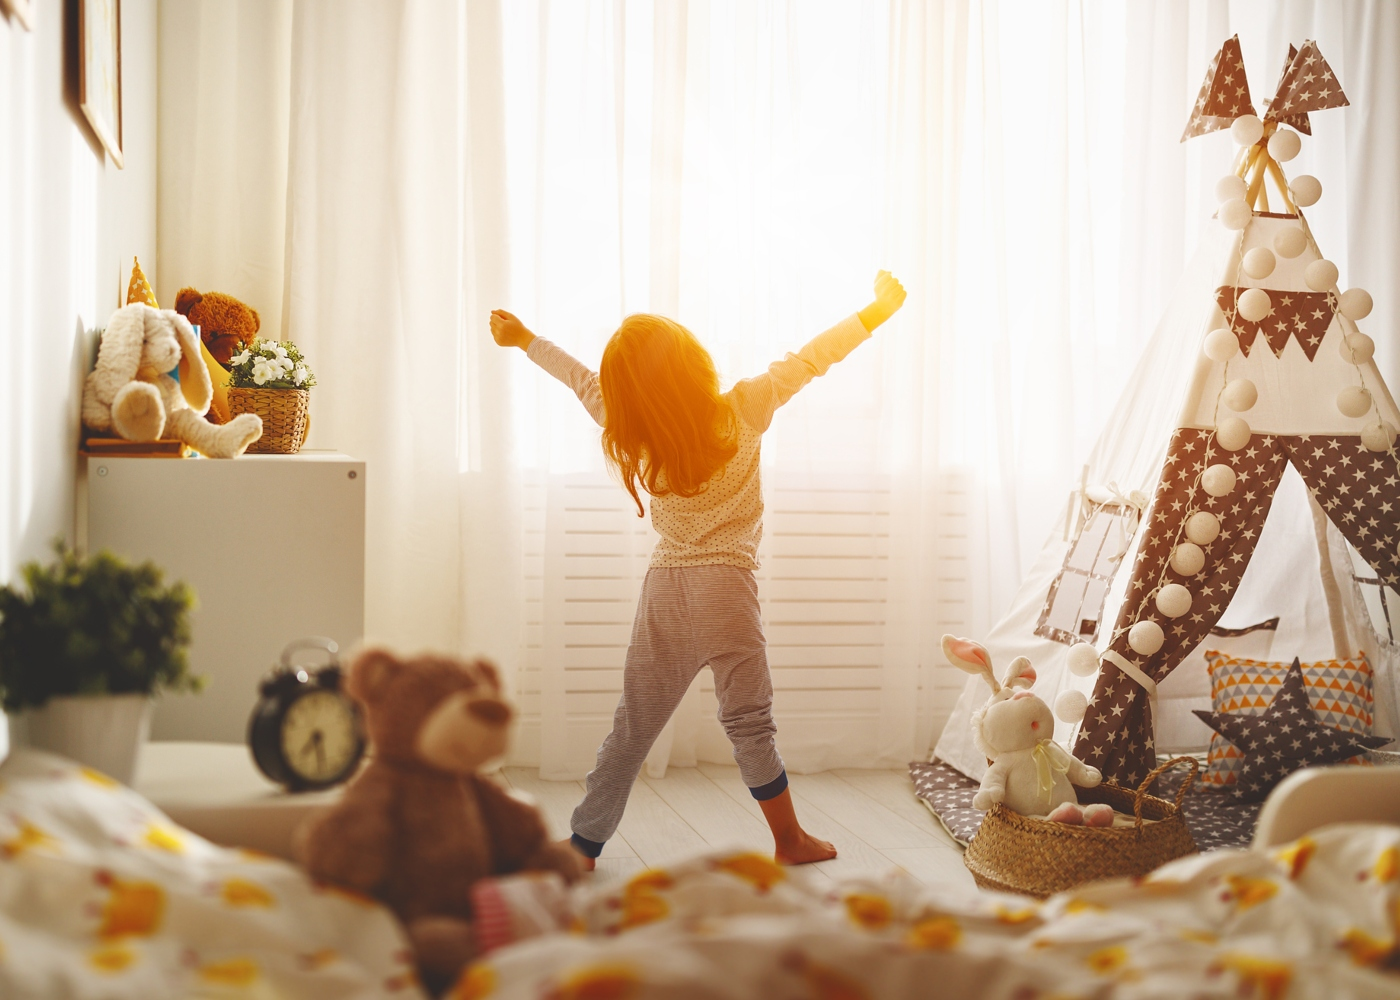 Menina a levantar-se da cama de manhã